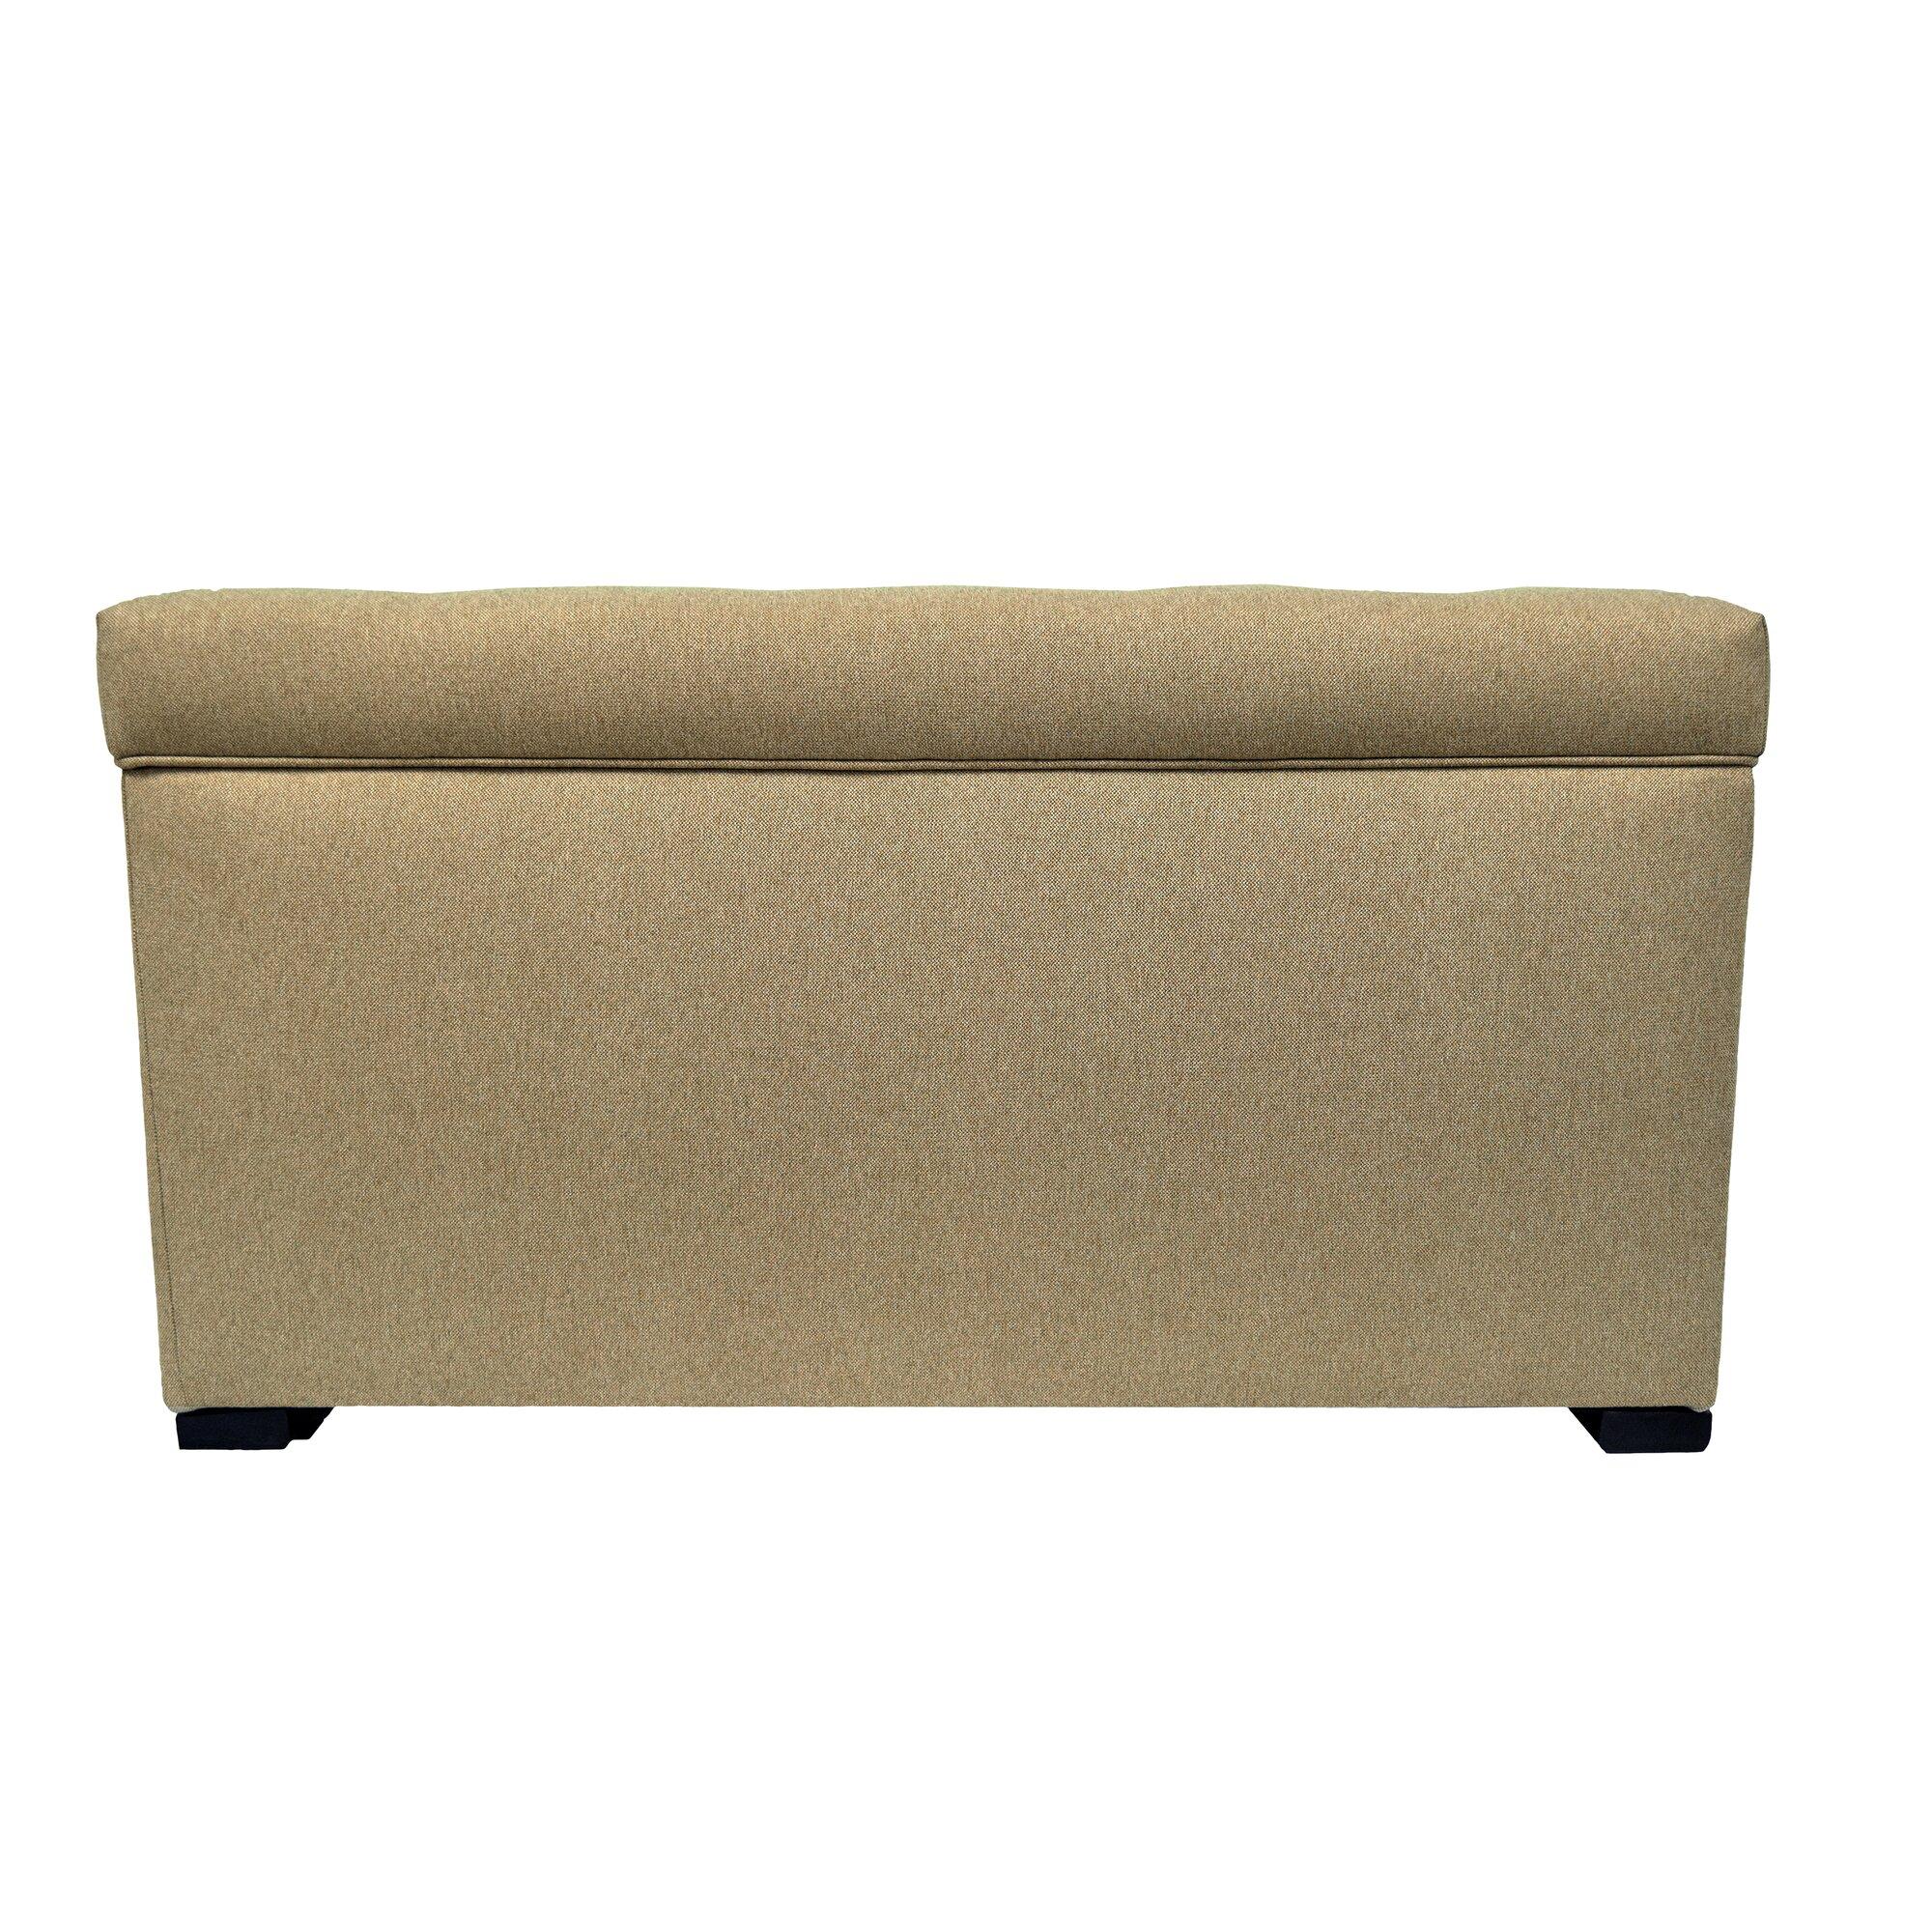 Allure Upholstered Storage Bedroom Bench Reviews Birch Lane